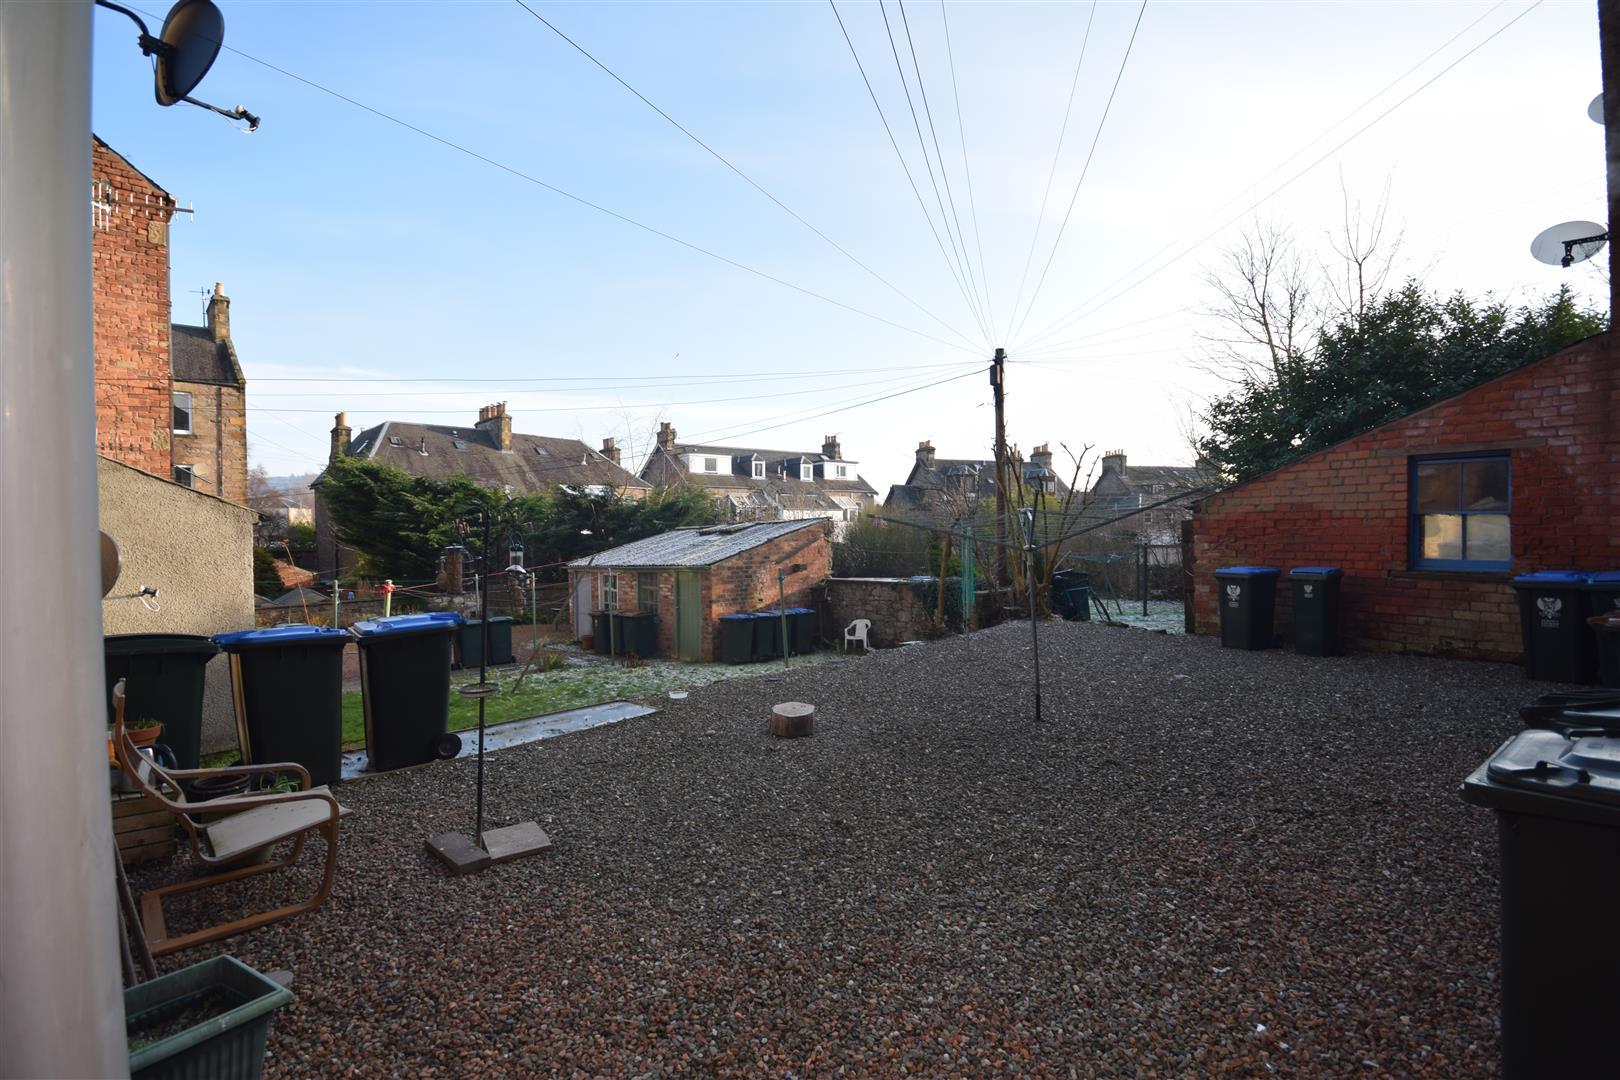 40A, Friar Street, Perth, Perthshire, PH2 0ED, UK